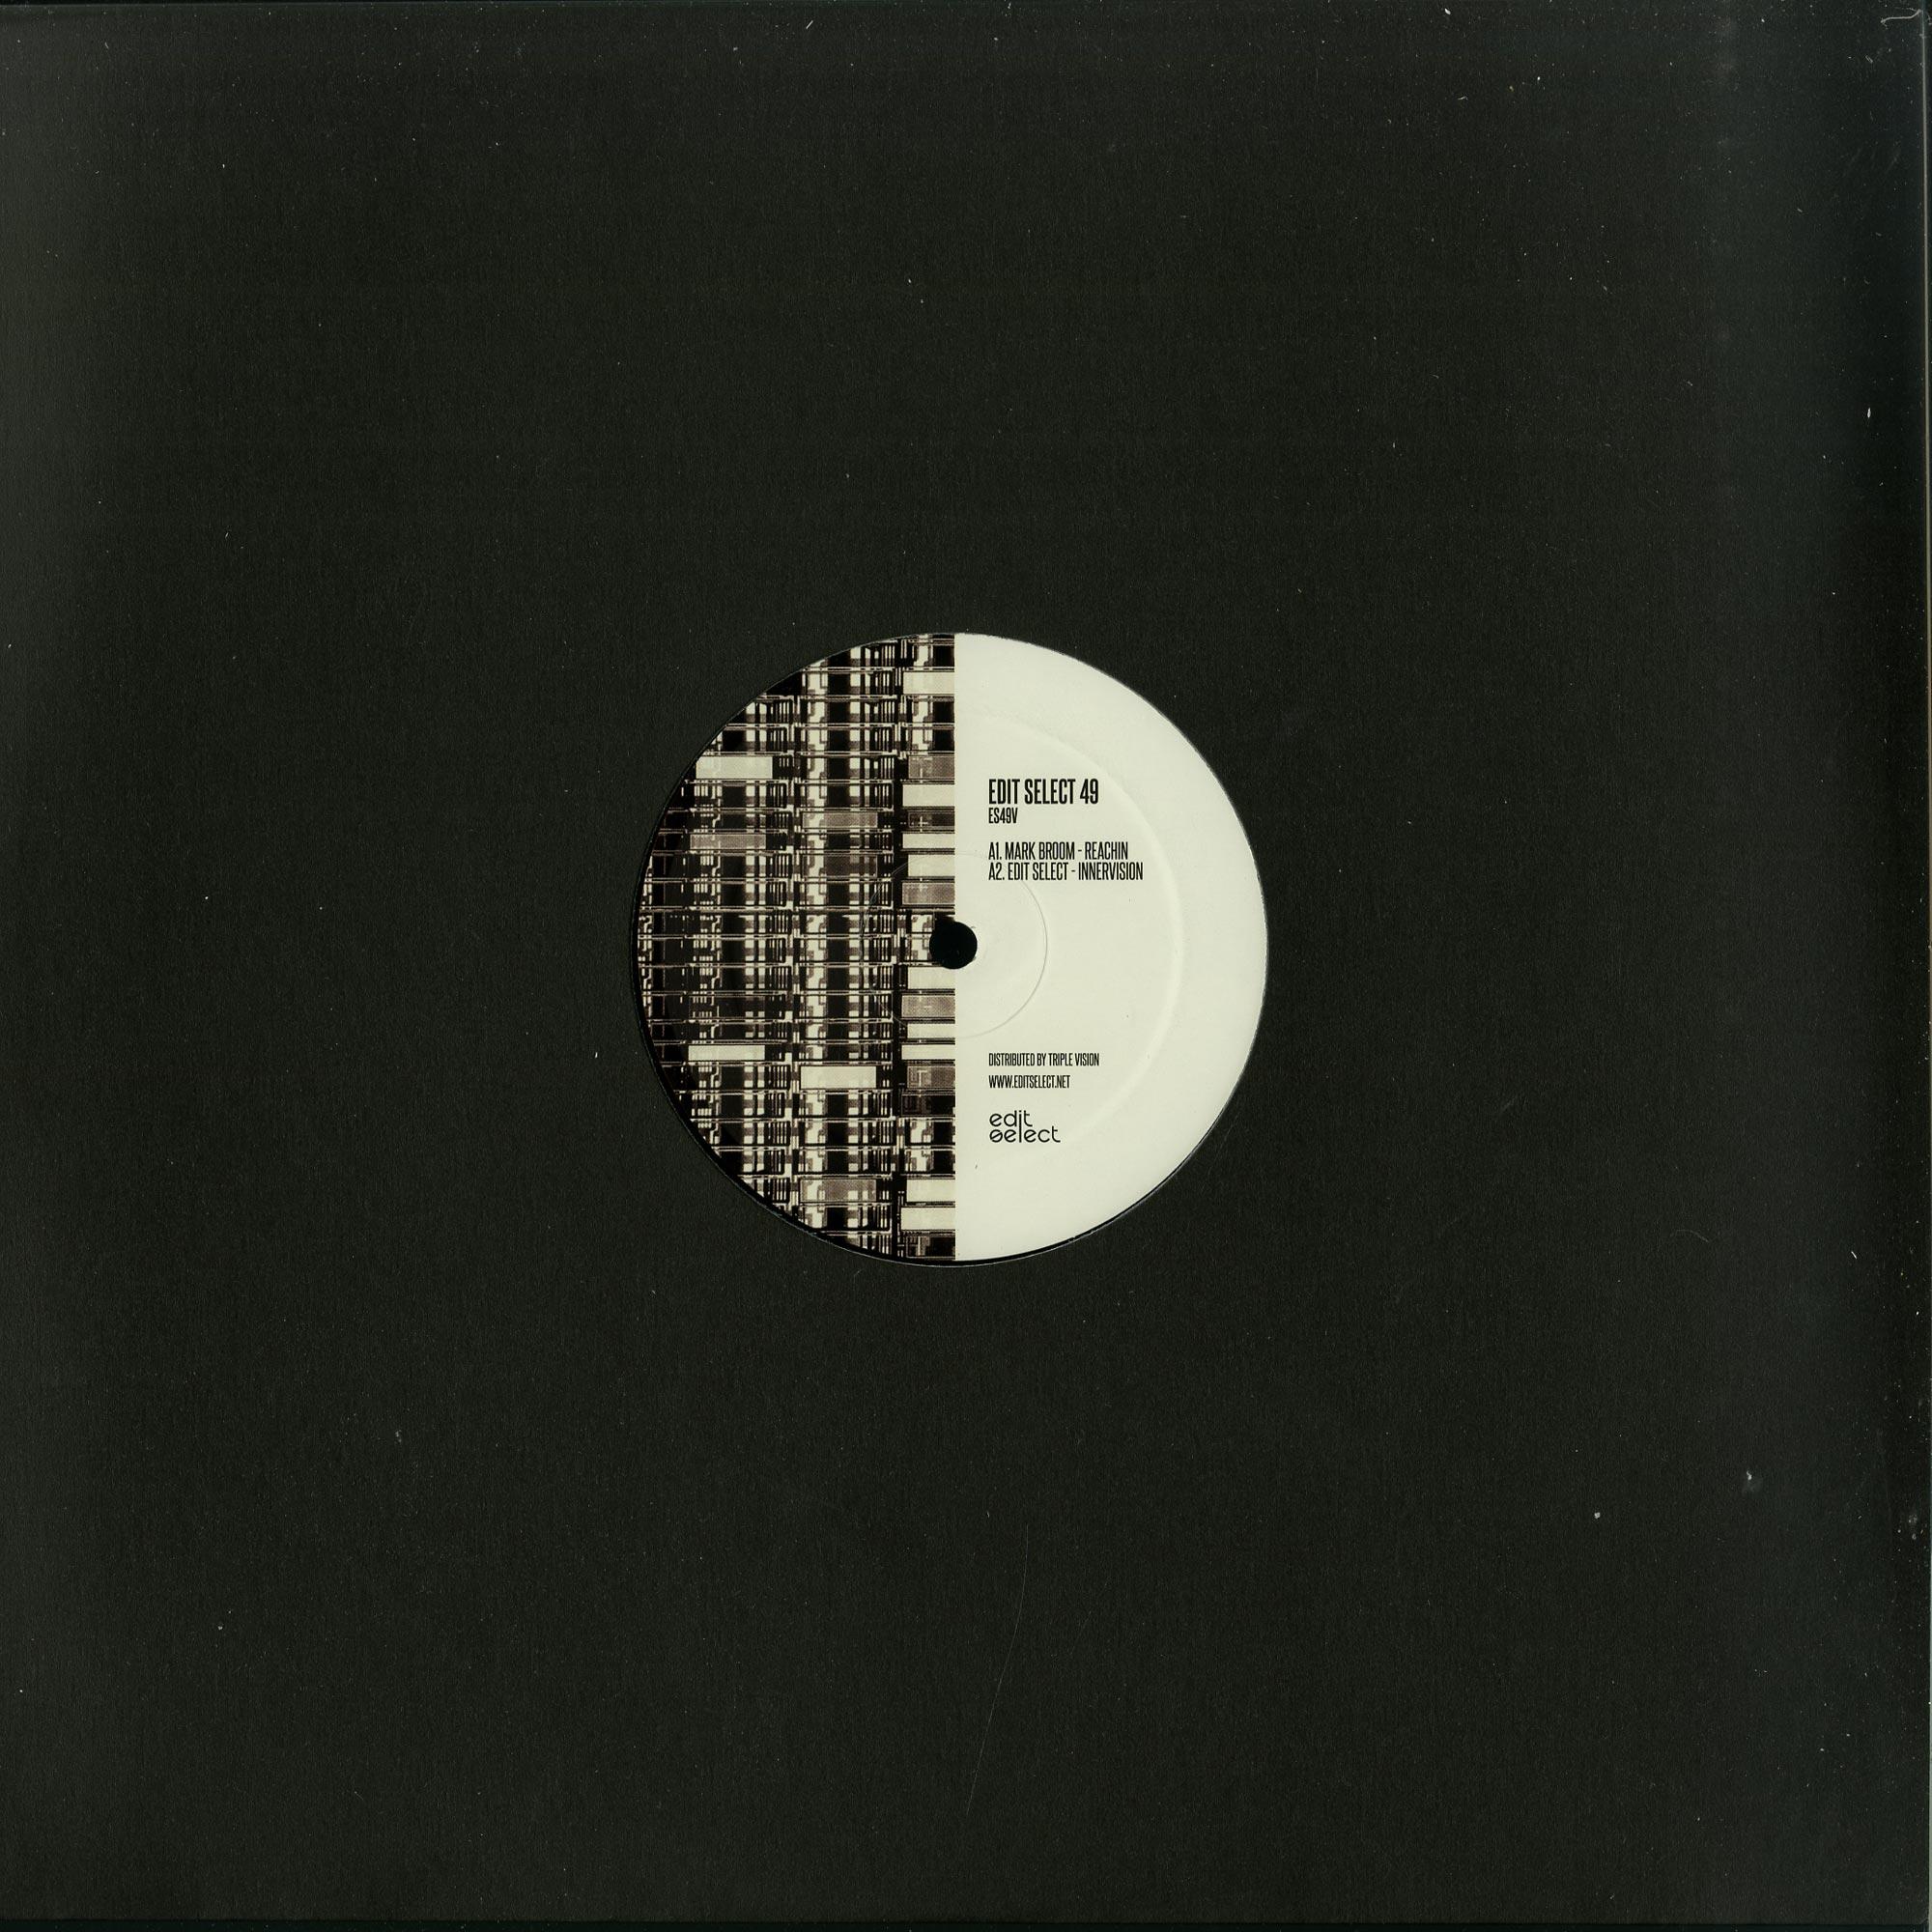 Mark Broom / Edit Select / Refracted / Mod21 - INNER VISION EP